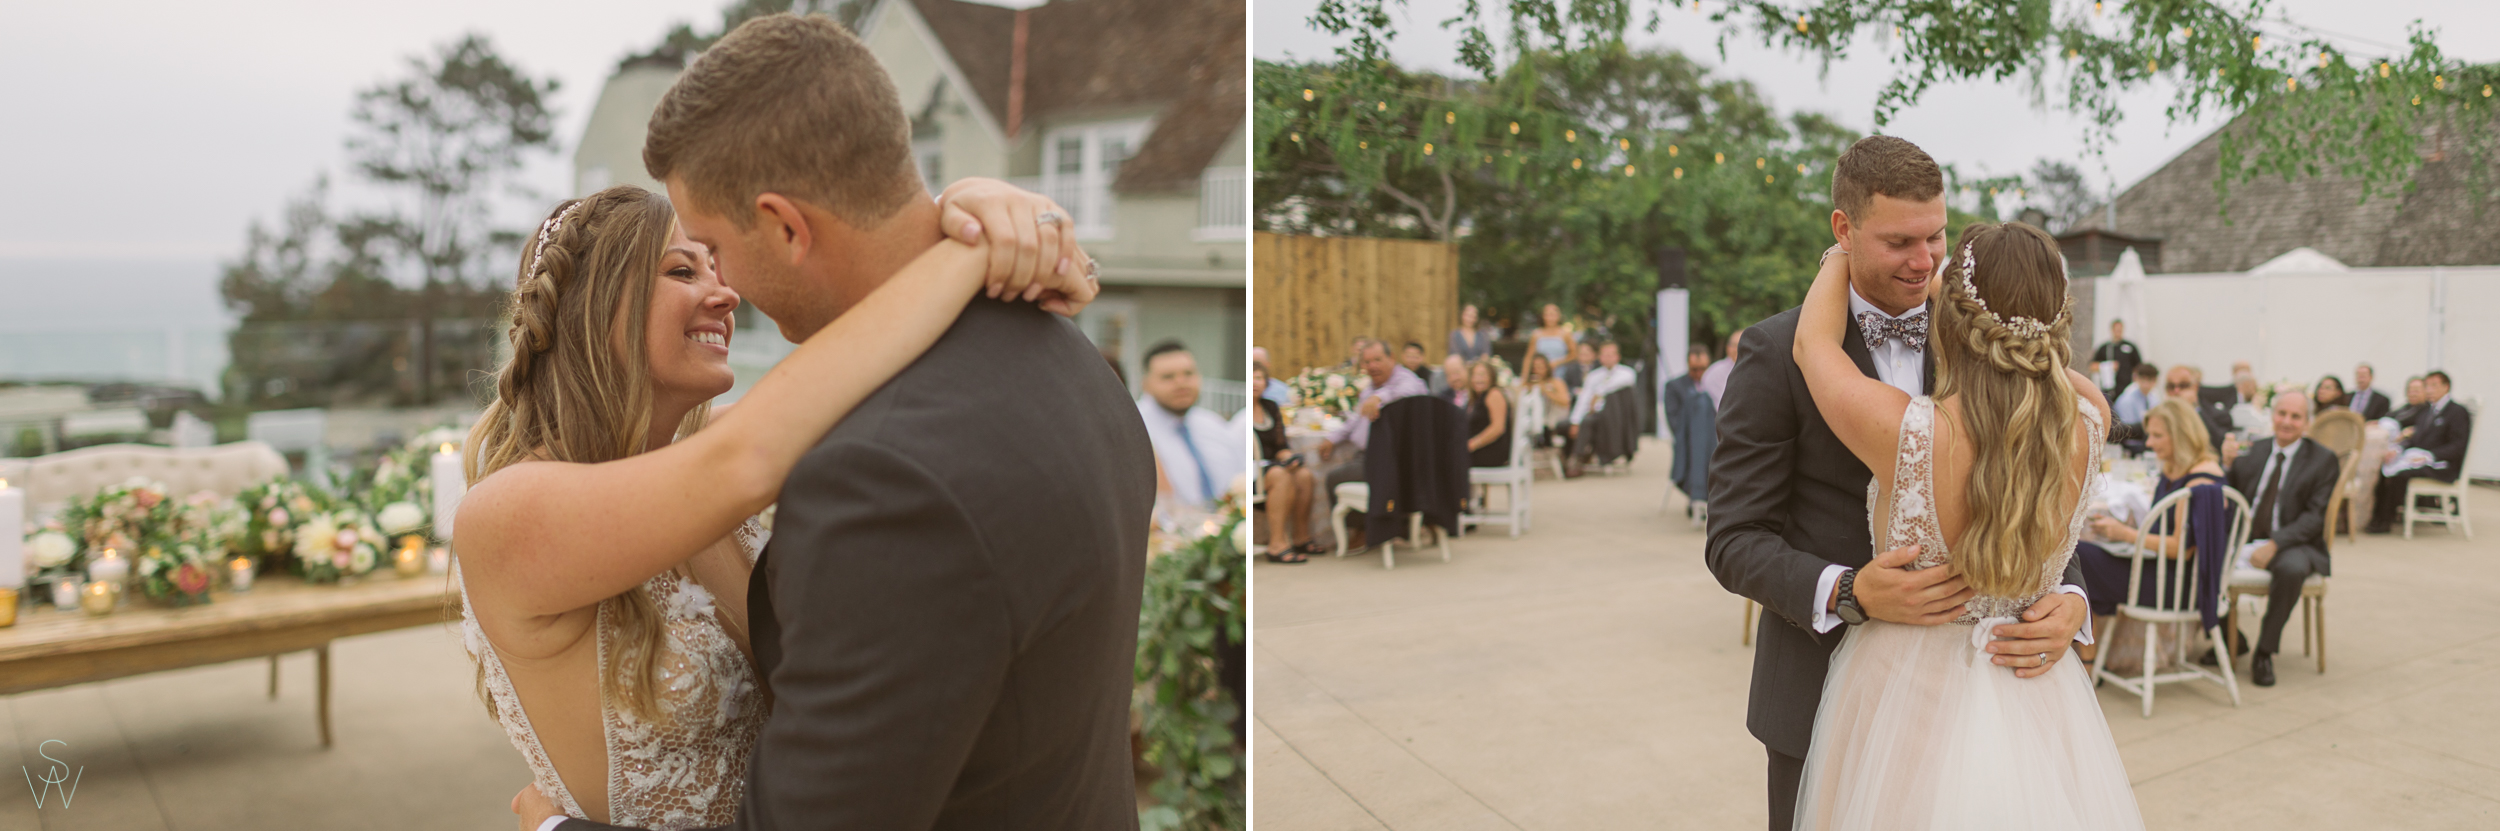 215Lauberge.shewanders.wedding.first.dance.photography.JPG